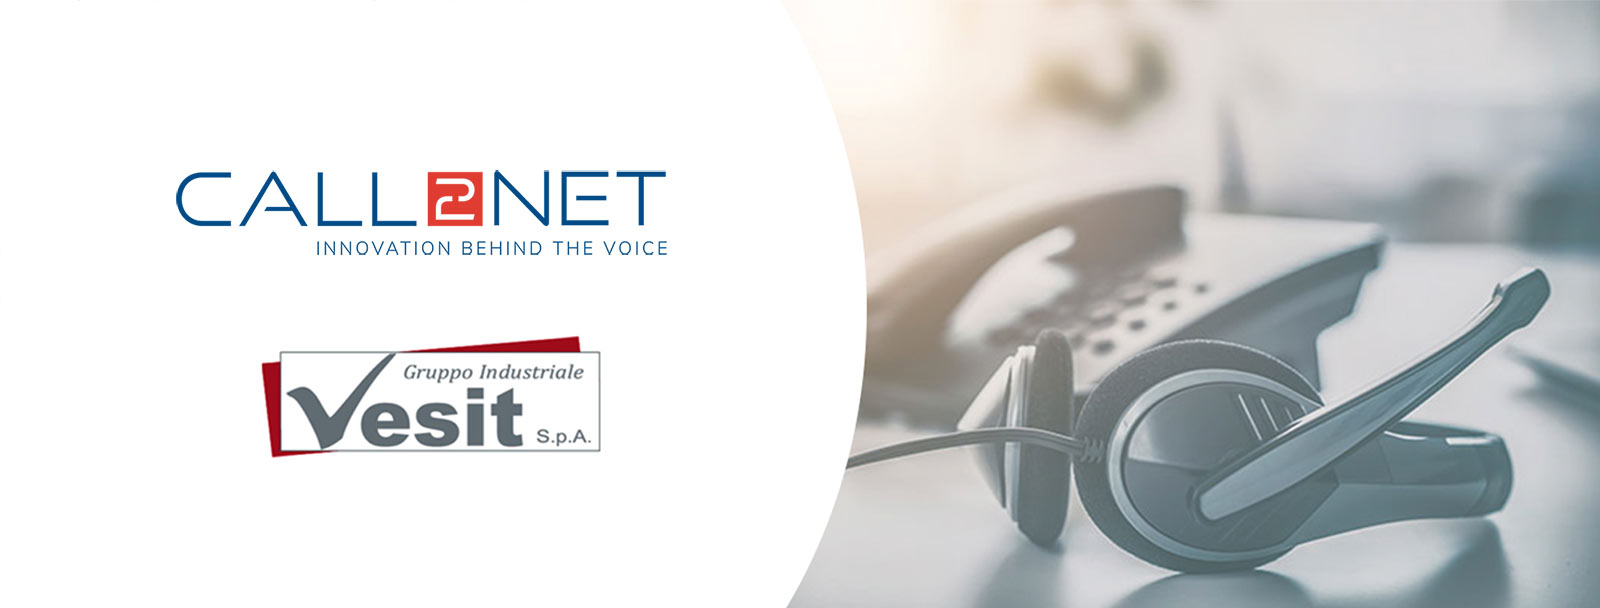 Call2Net per Vesit SpA